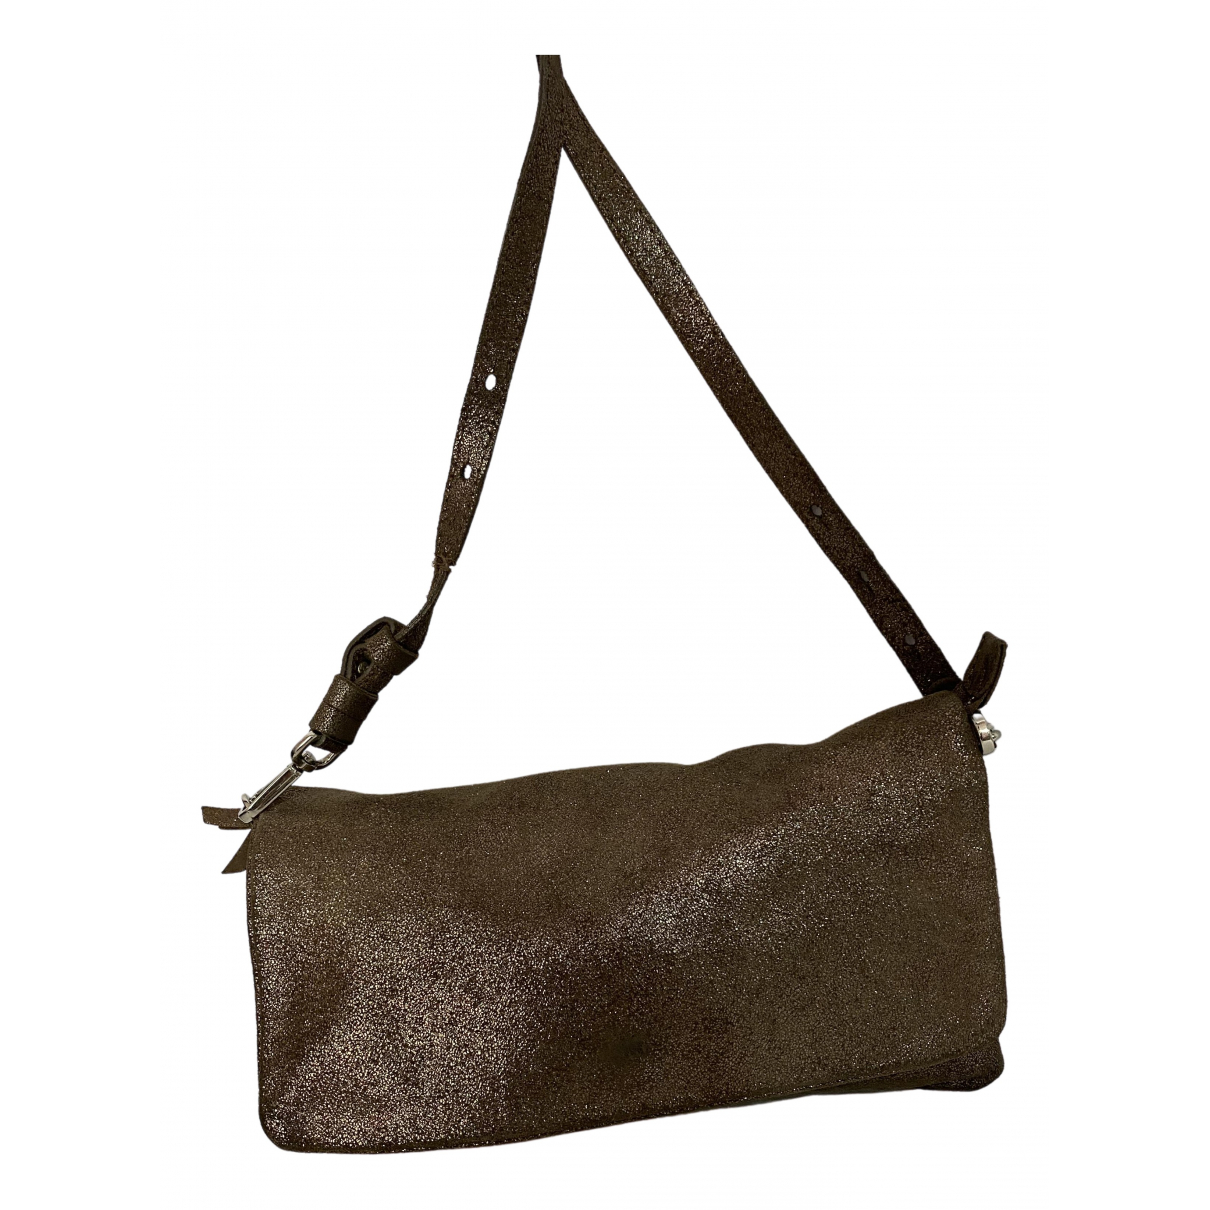 Gianni Chiarini \N Leather handbag for Women \N